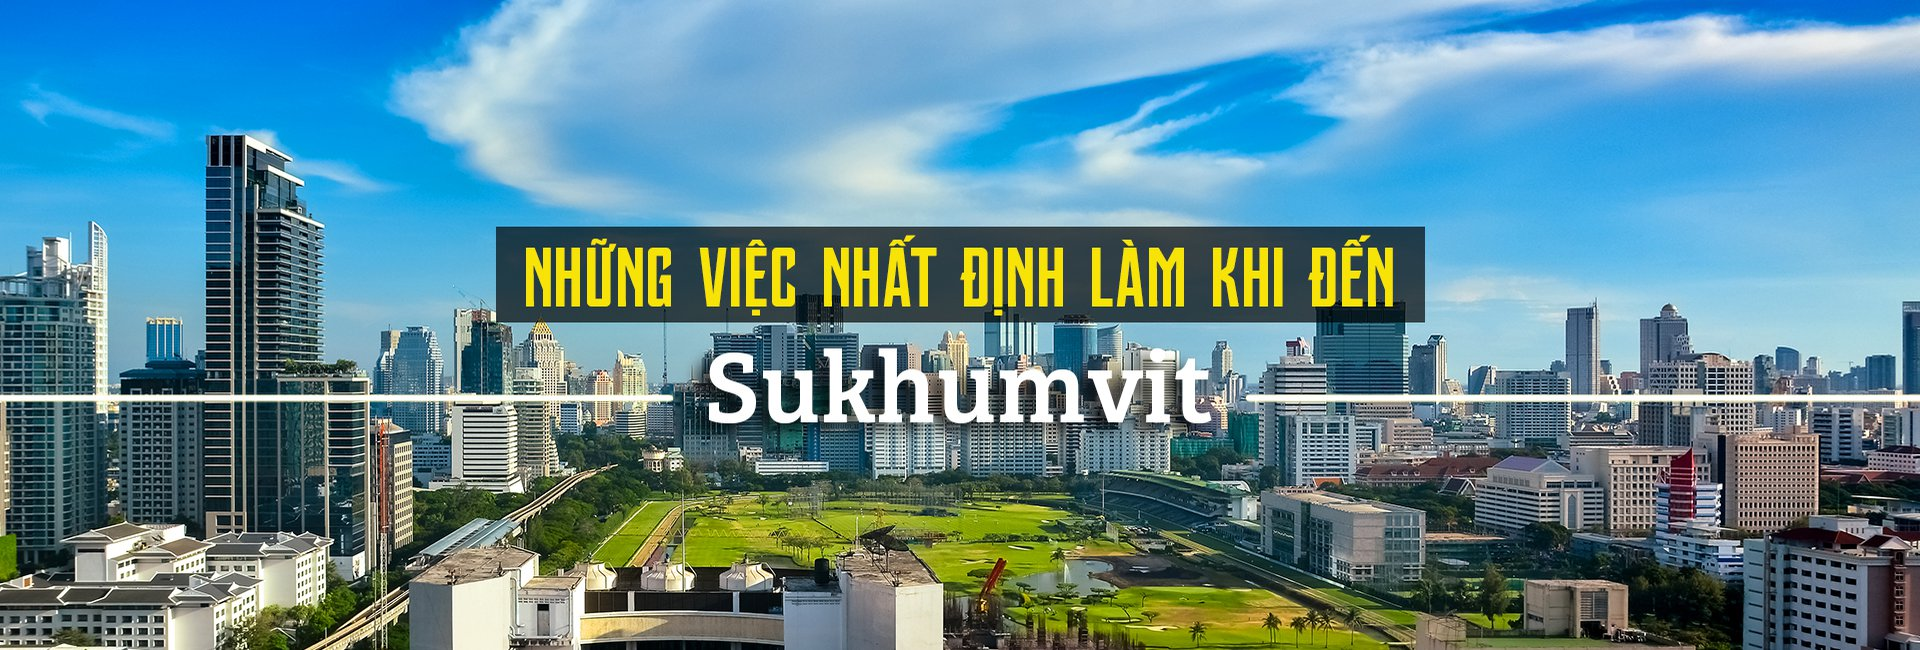 Top 10 trải nghiệm thú vị tại Sukhumvit, Bangkok